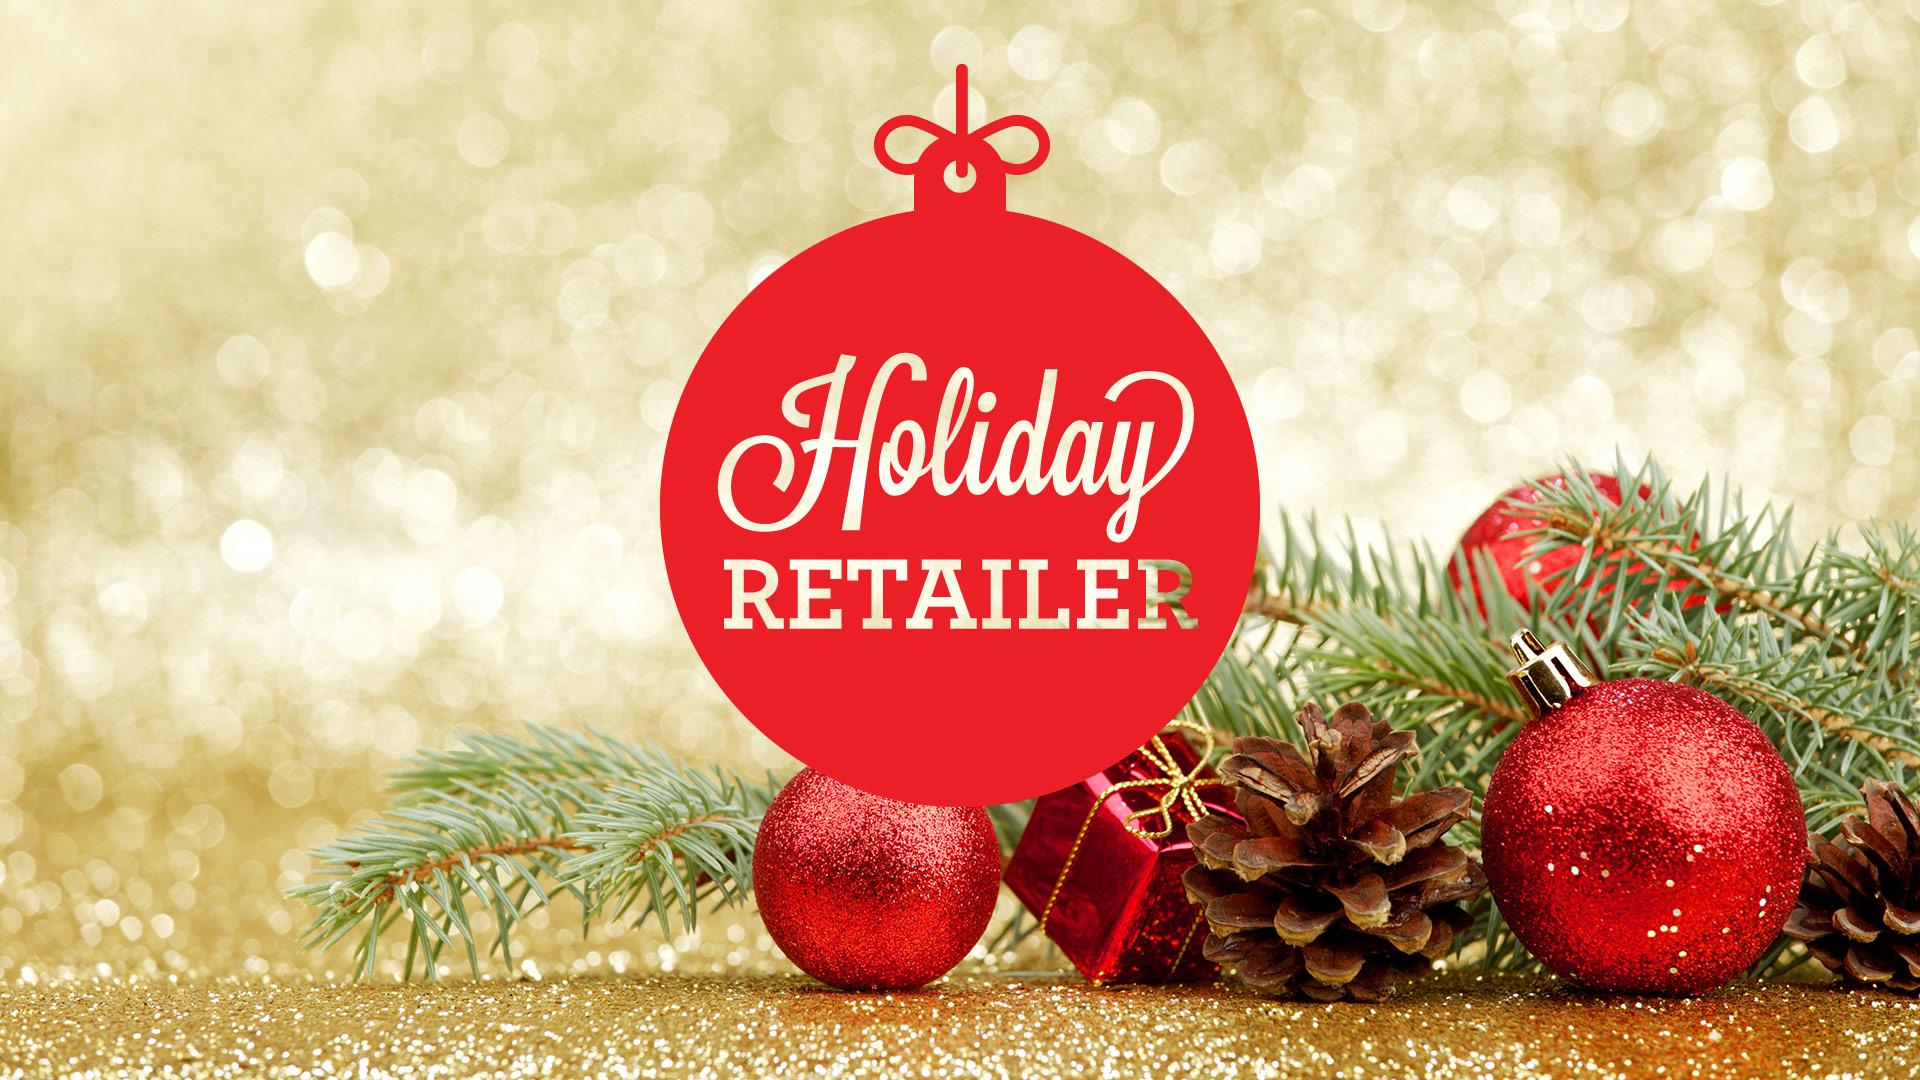 holiday-retailer2016c-ss-1920